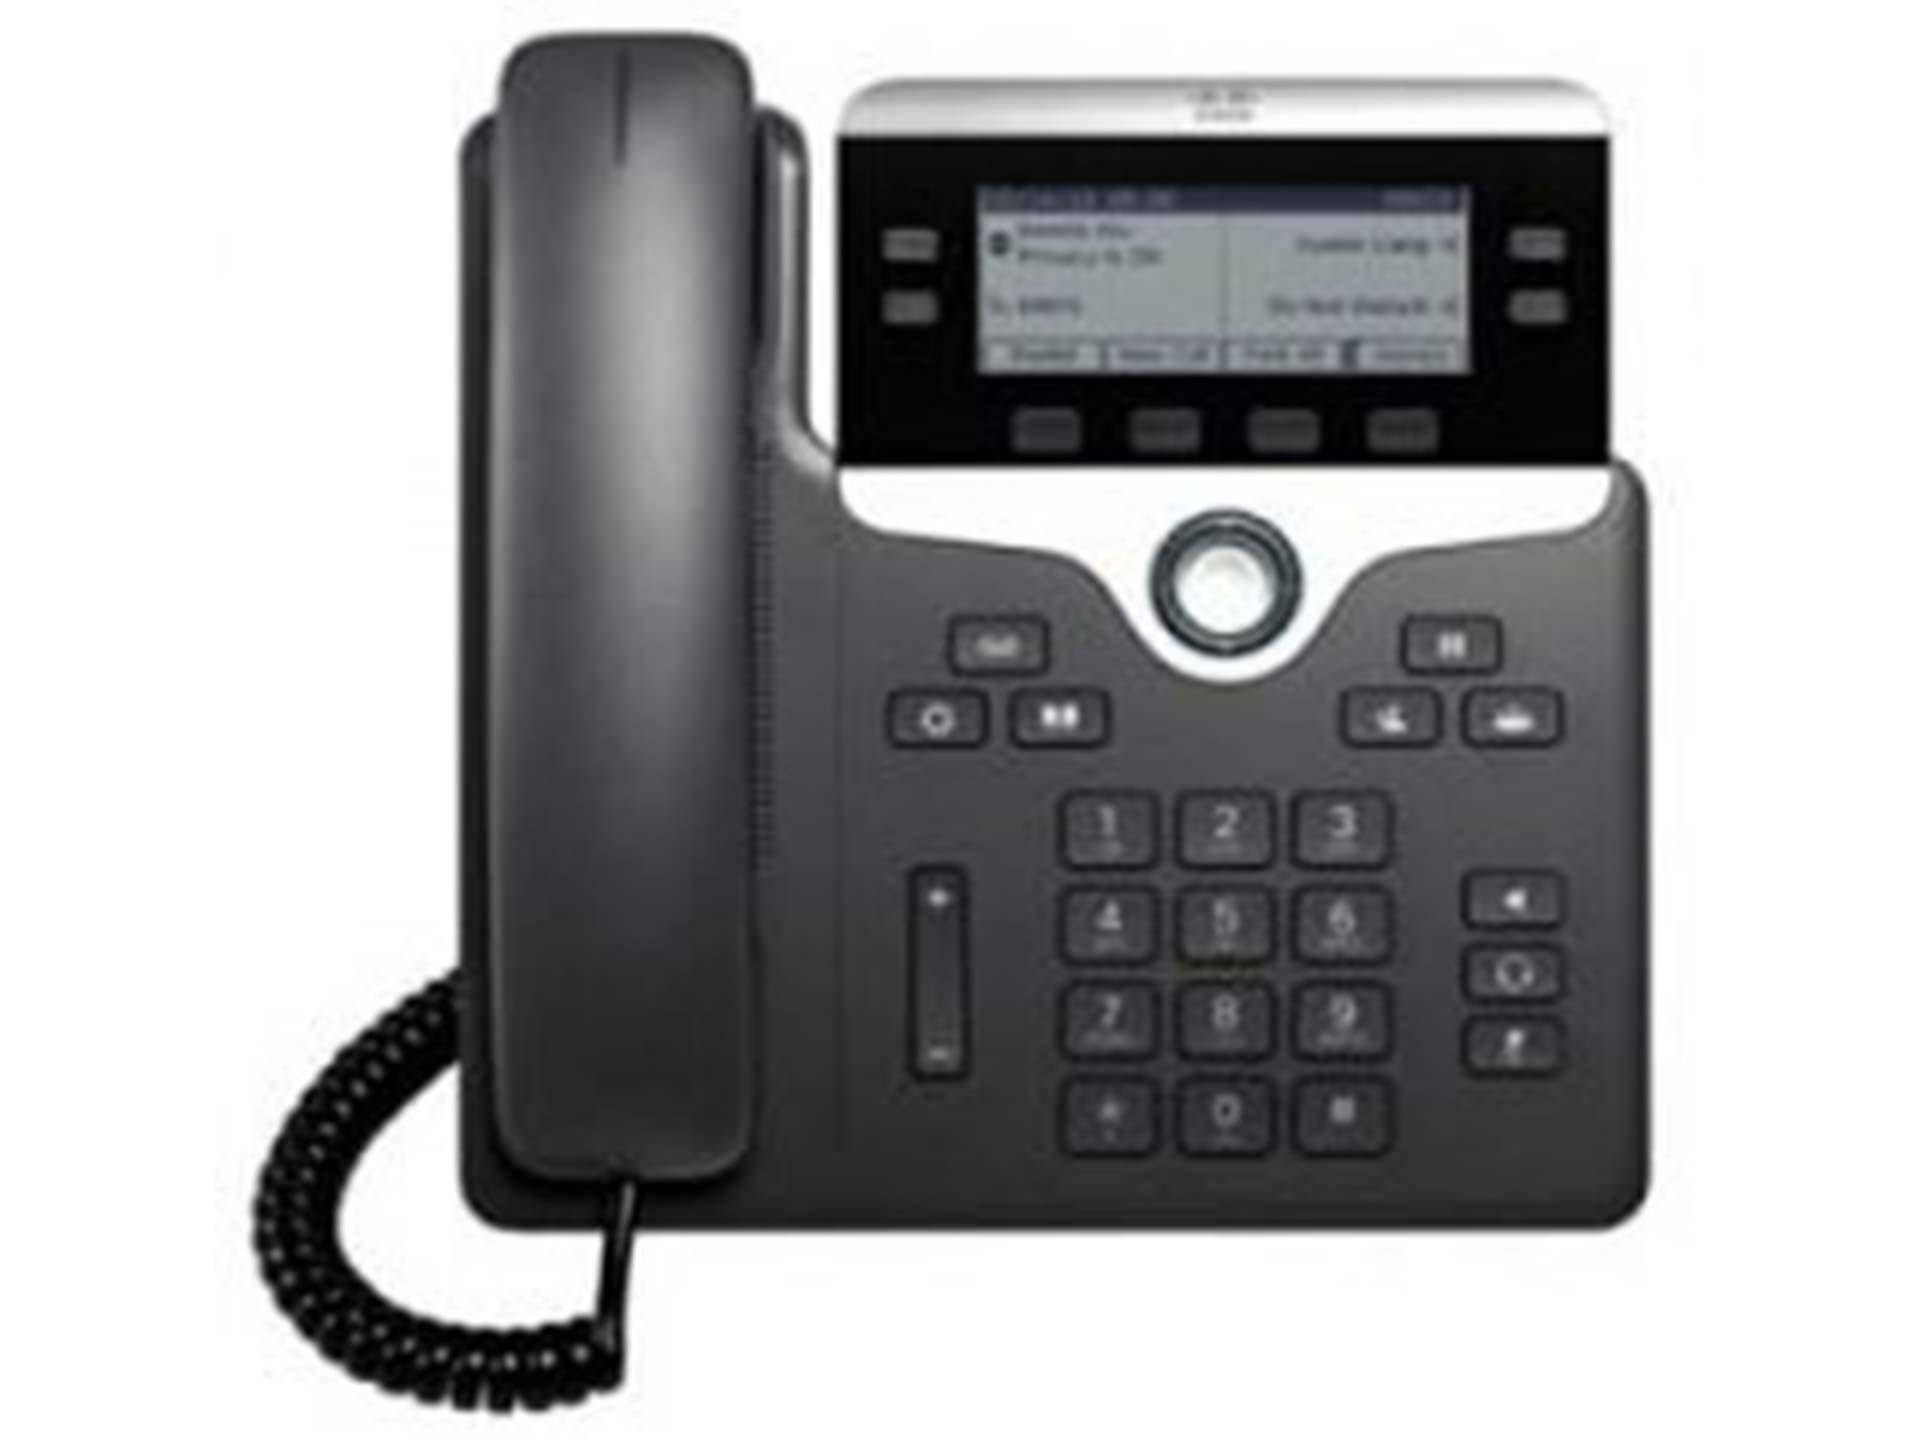 Kensoko com - Cisco 7821 IP Phone 2 Lines 2 Ethernets Port PoE